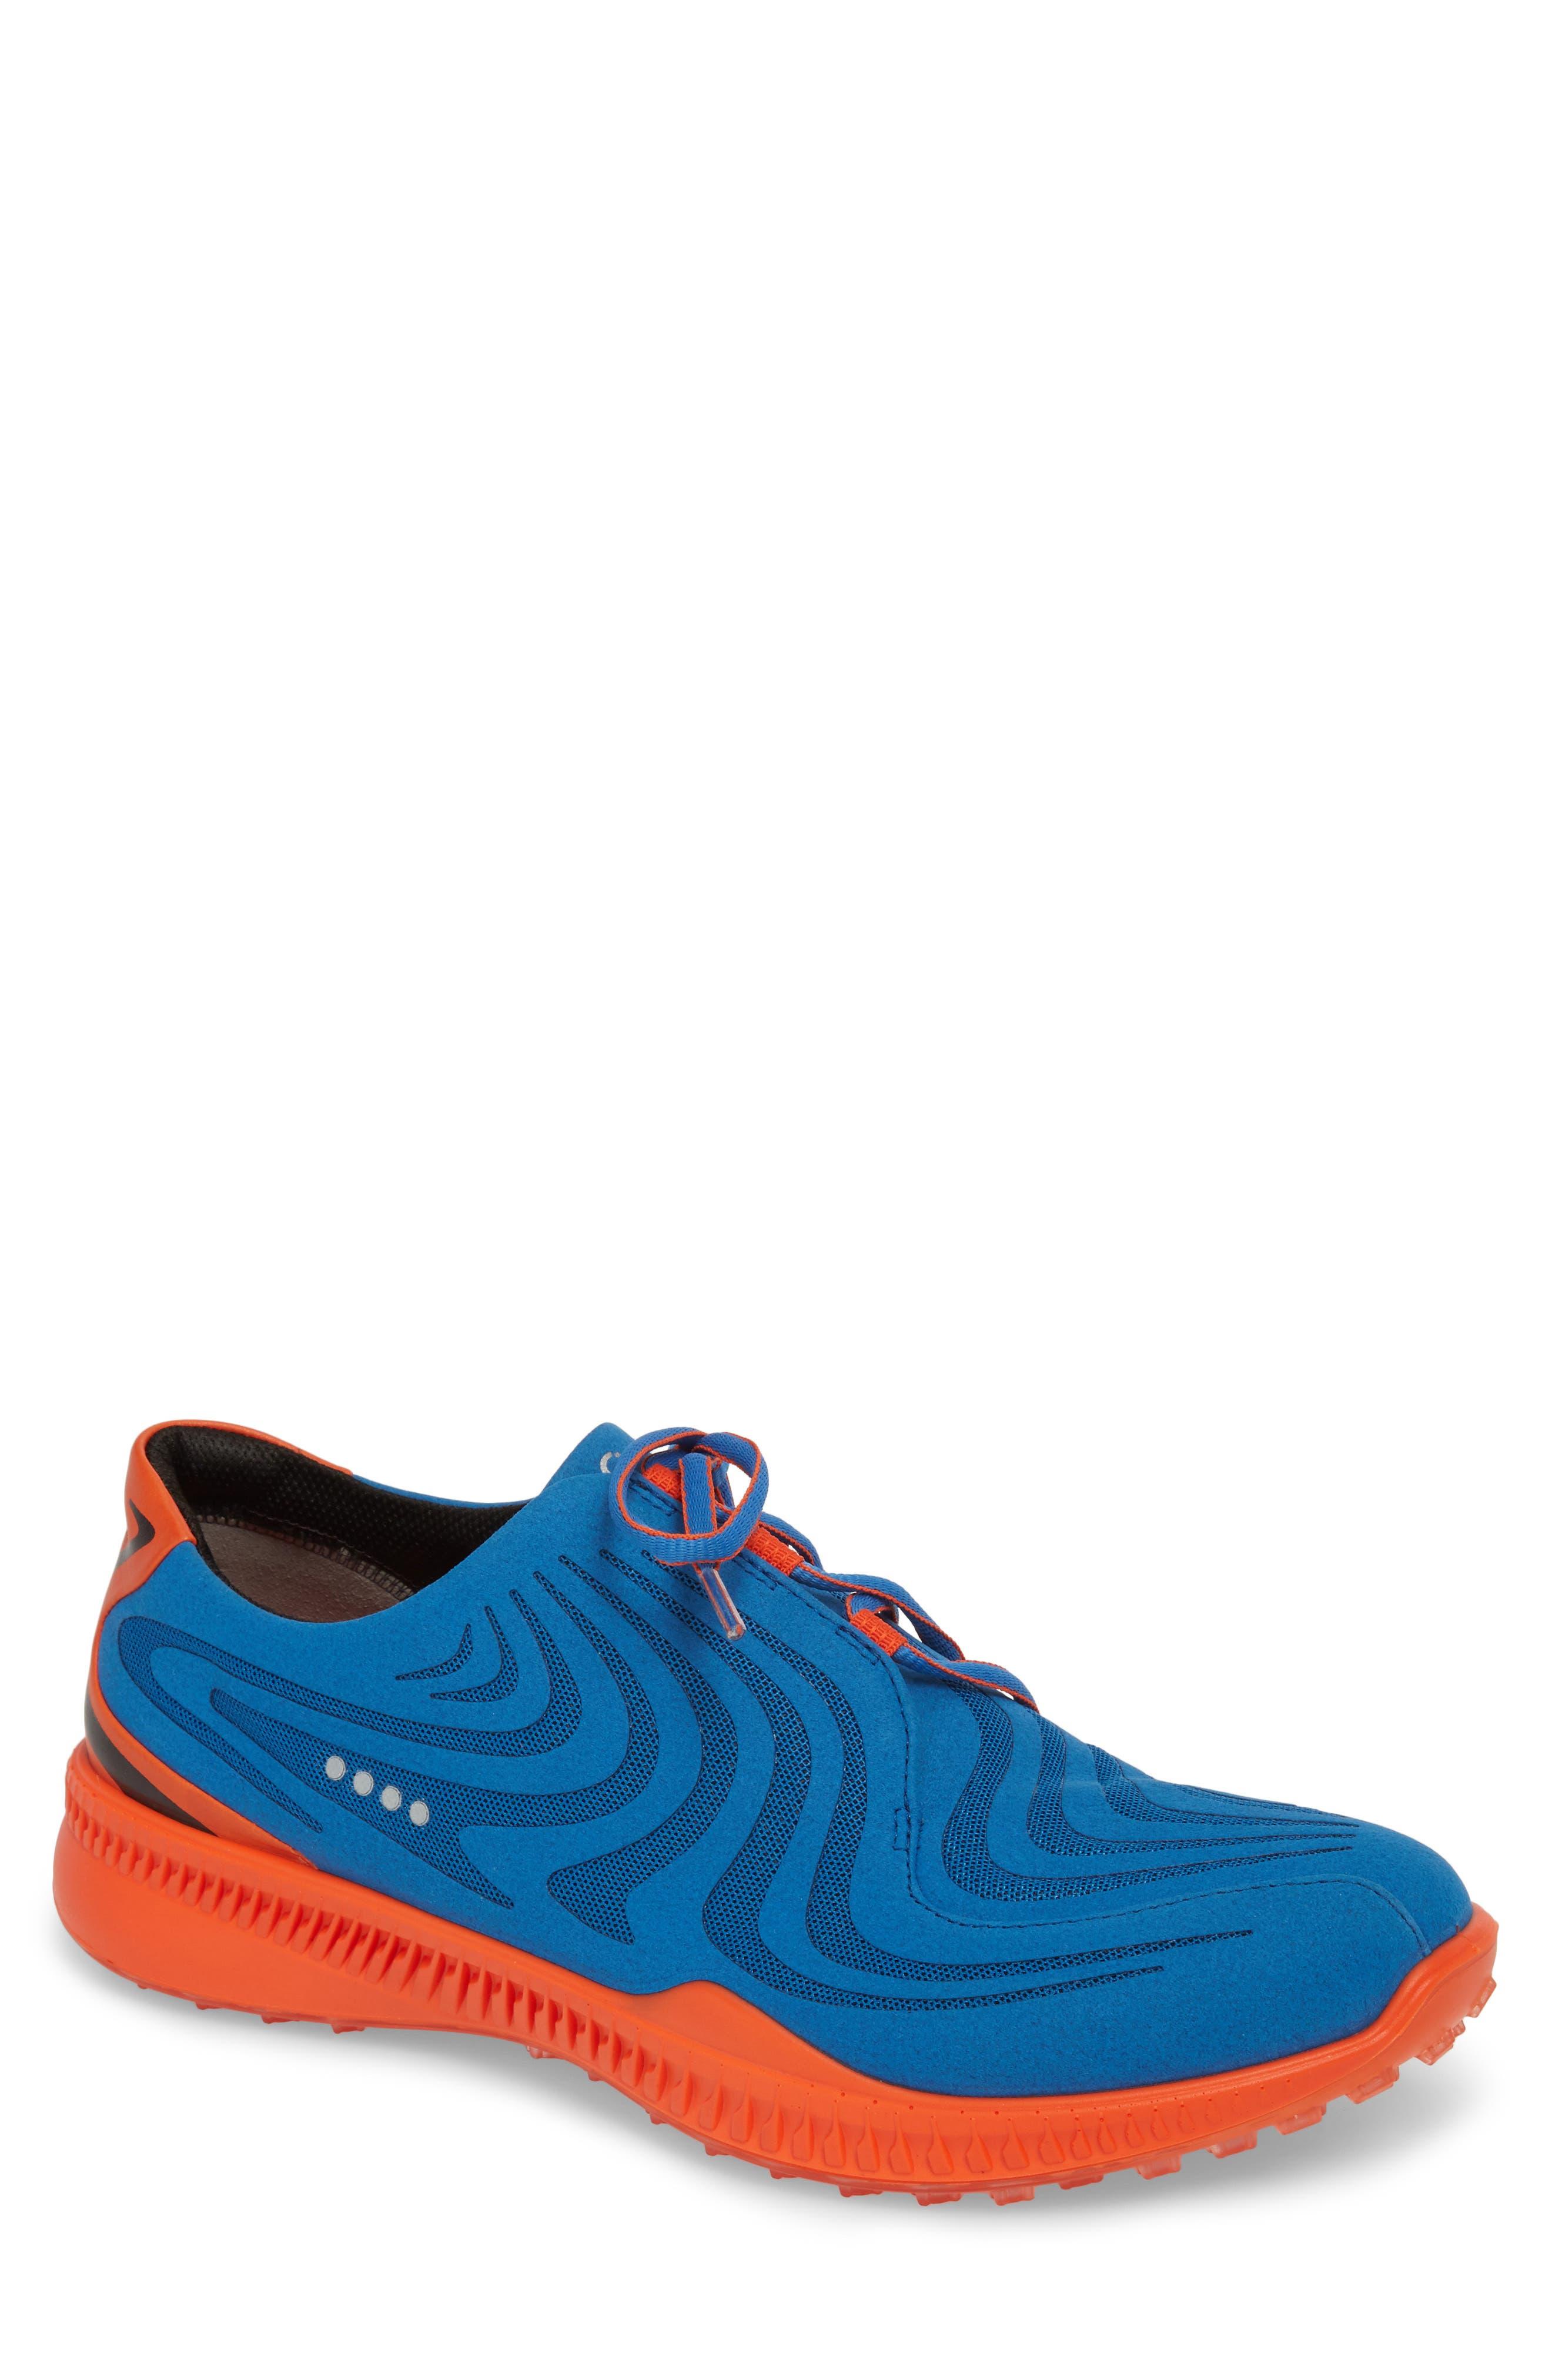 Golf S-Drive Water Resistant Shoe,                             Main thumbnail 1, color,                             Bermuda Blue Leather